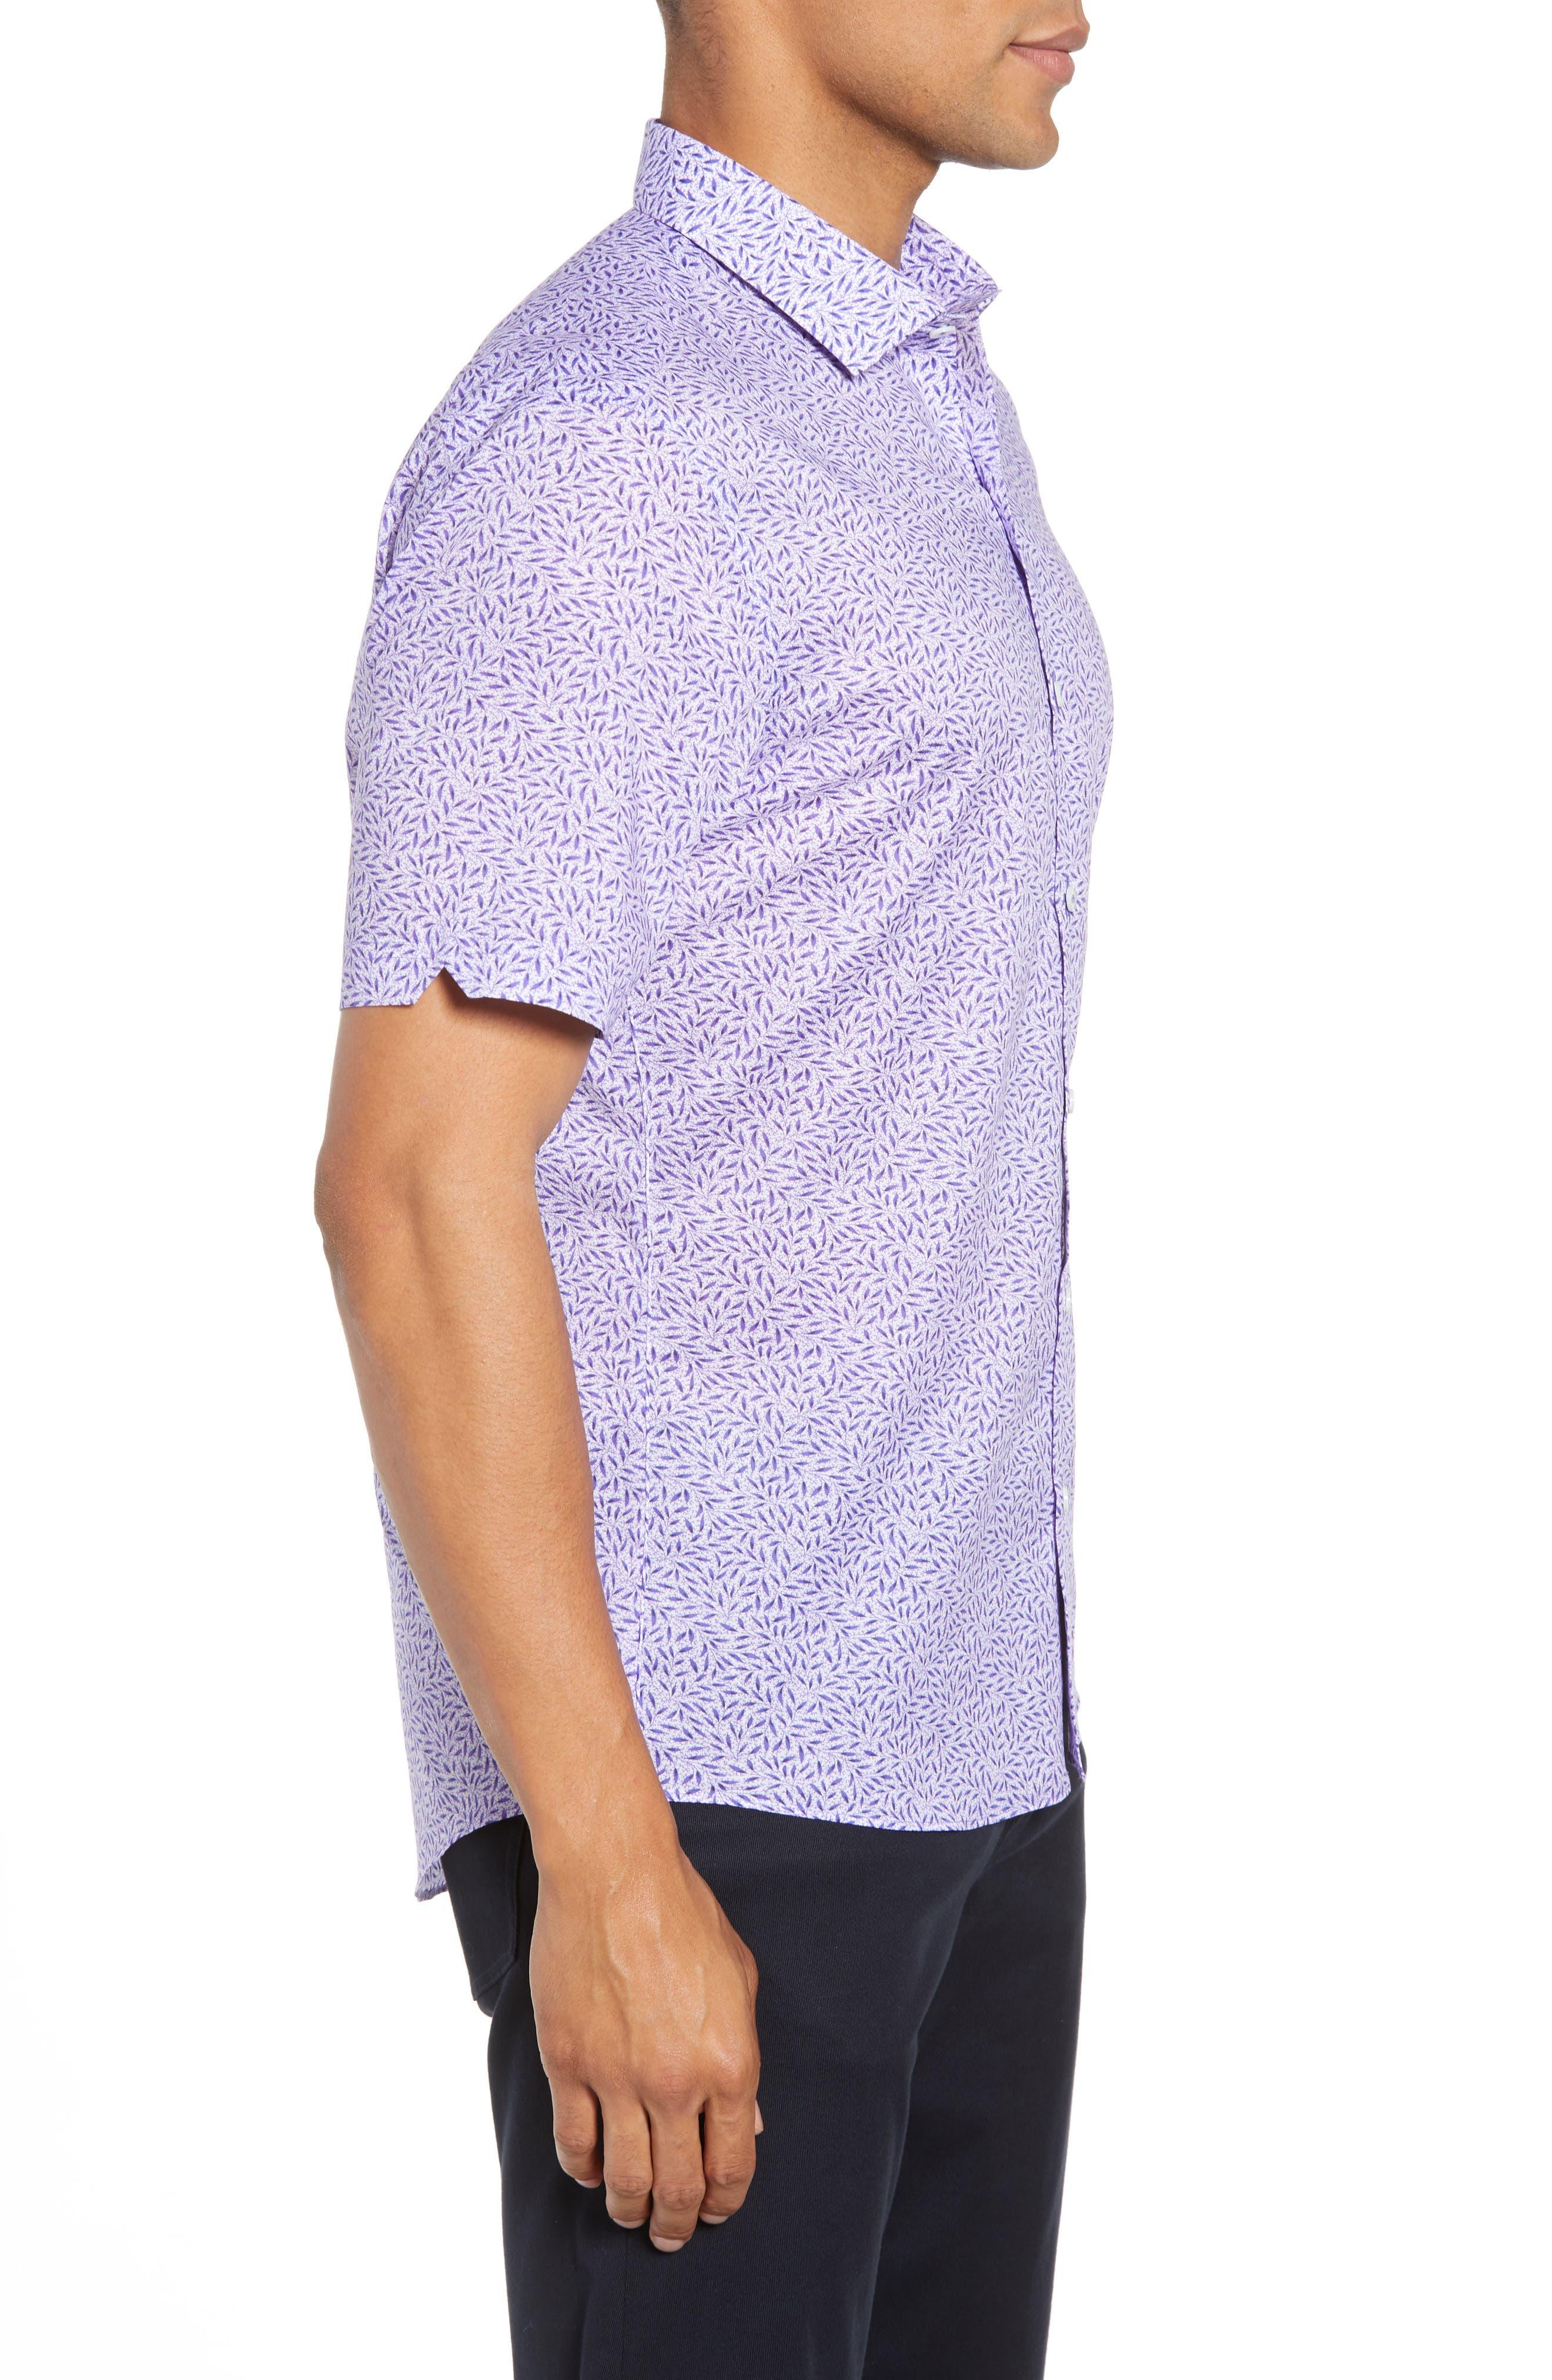 ZACHARY PRELL, Stiller Regular Fit Sport Shirt, Alternate thumbnail 3, color, PURPLE